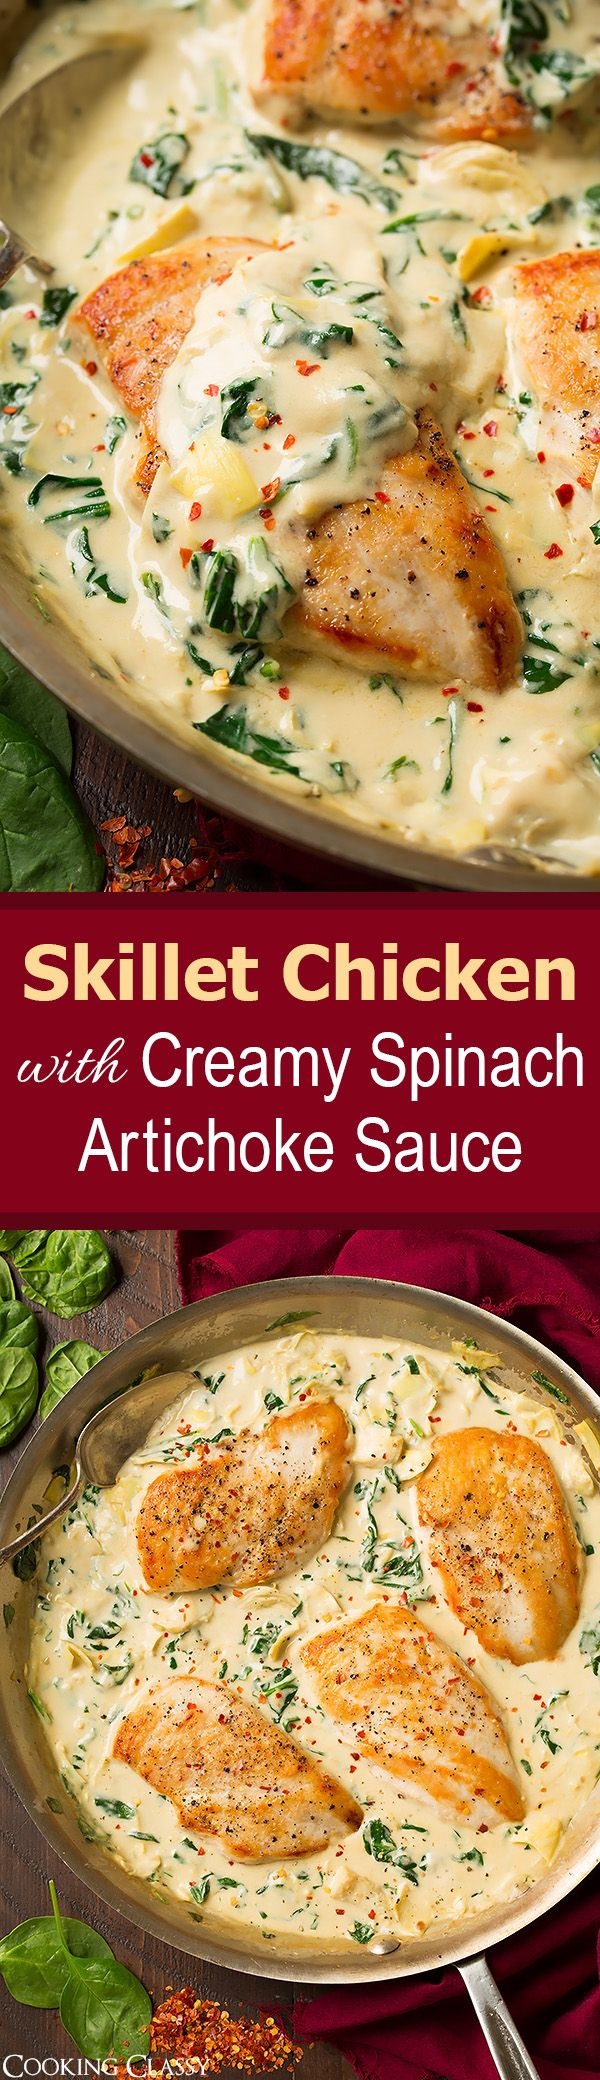 Skillet Chicken with Creamy Spinach Artichoke Sauce